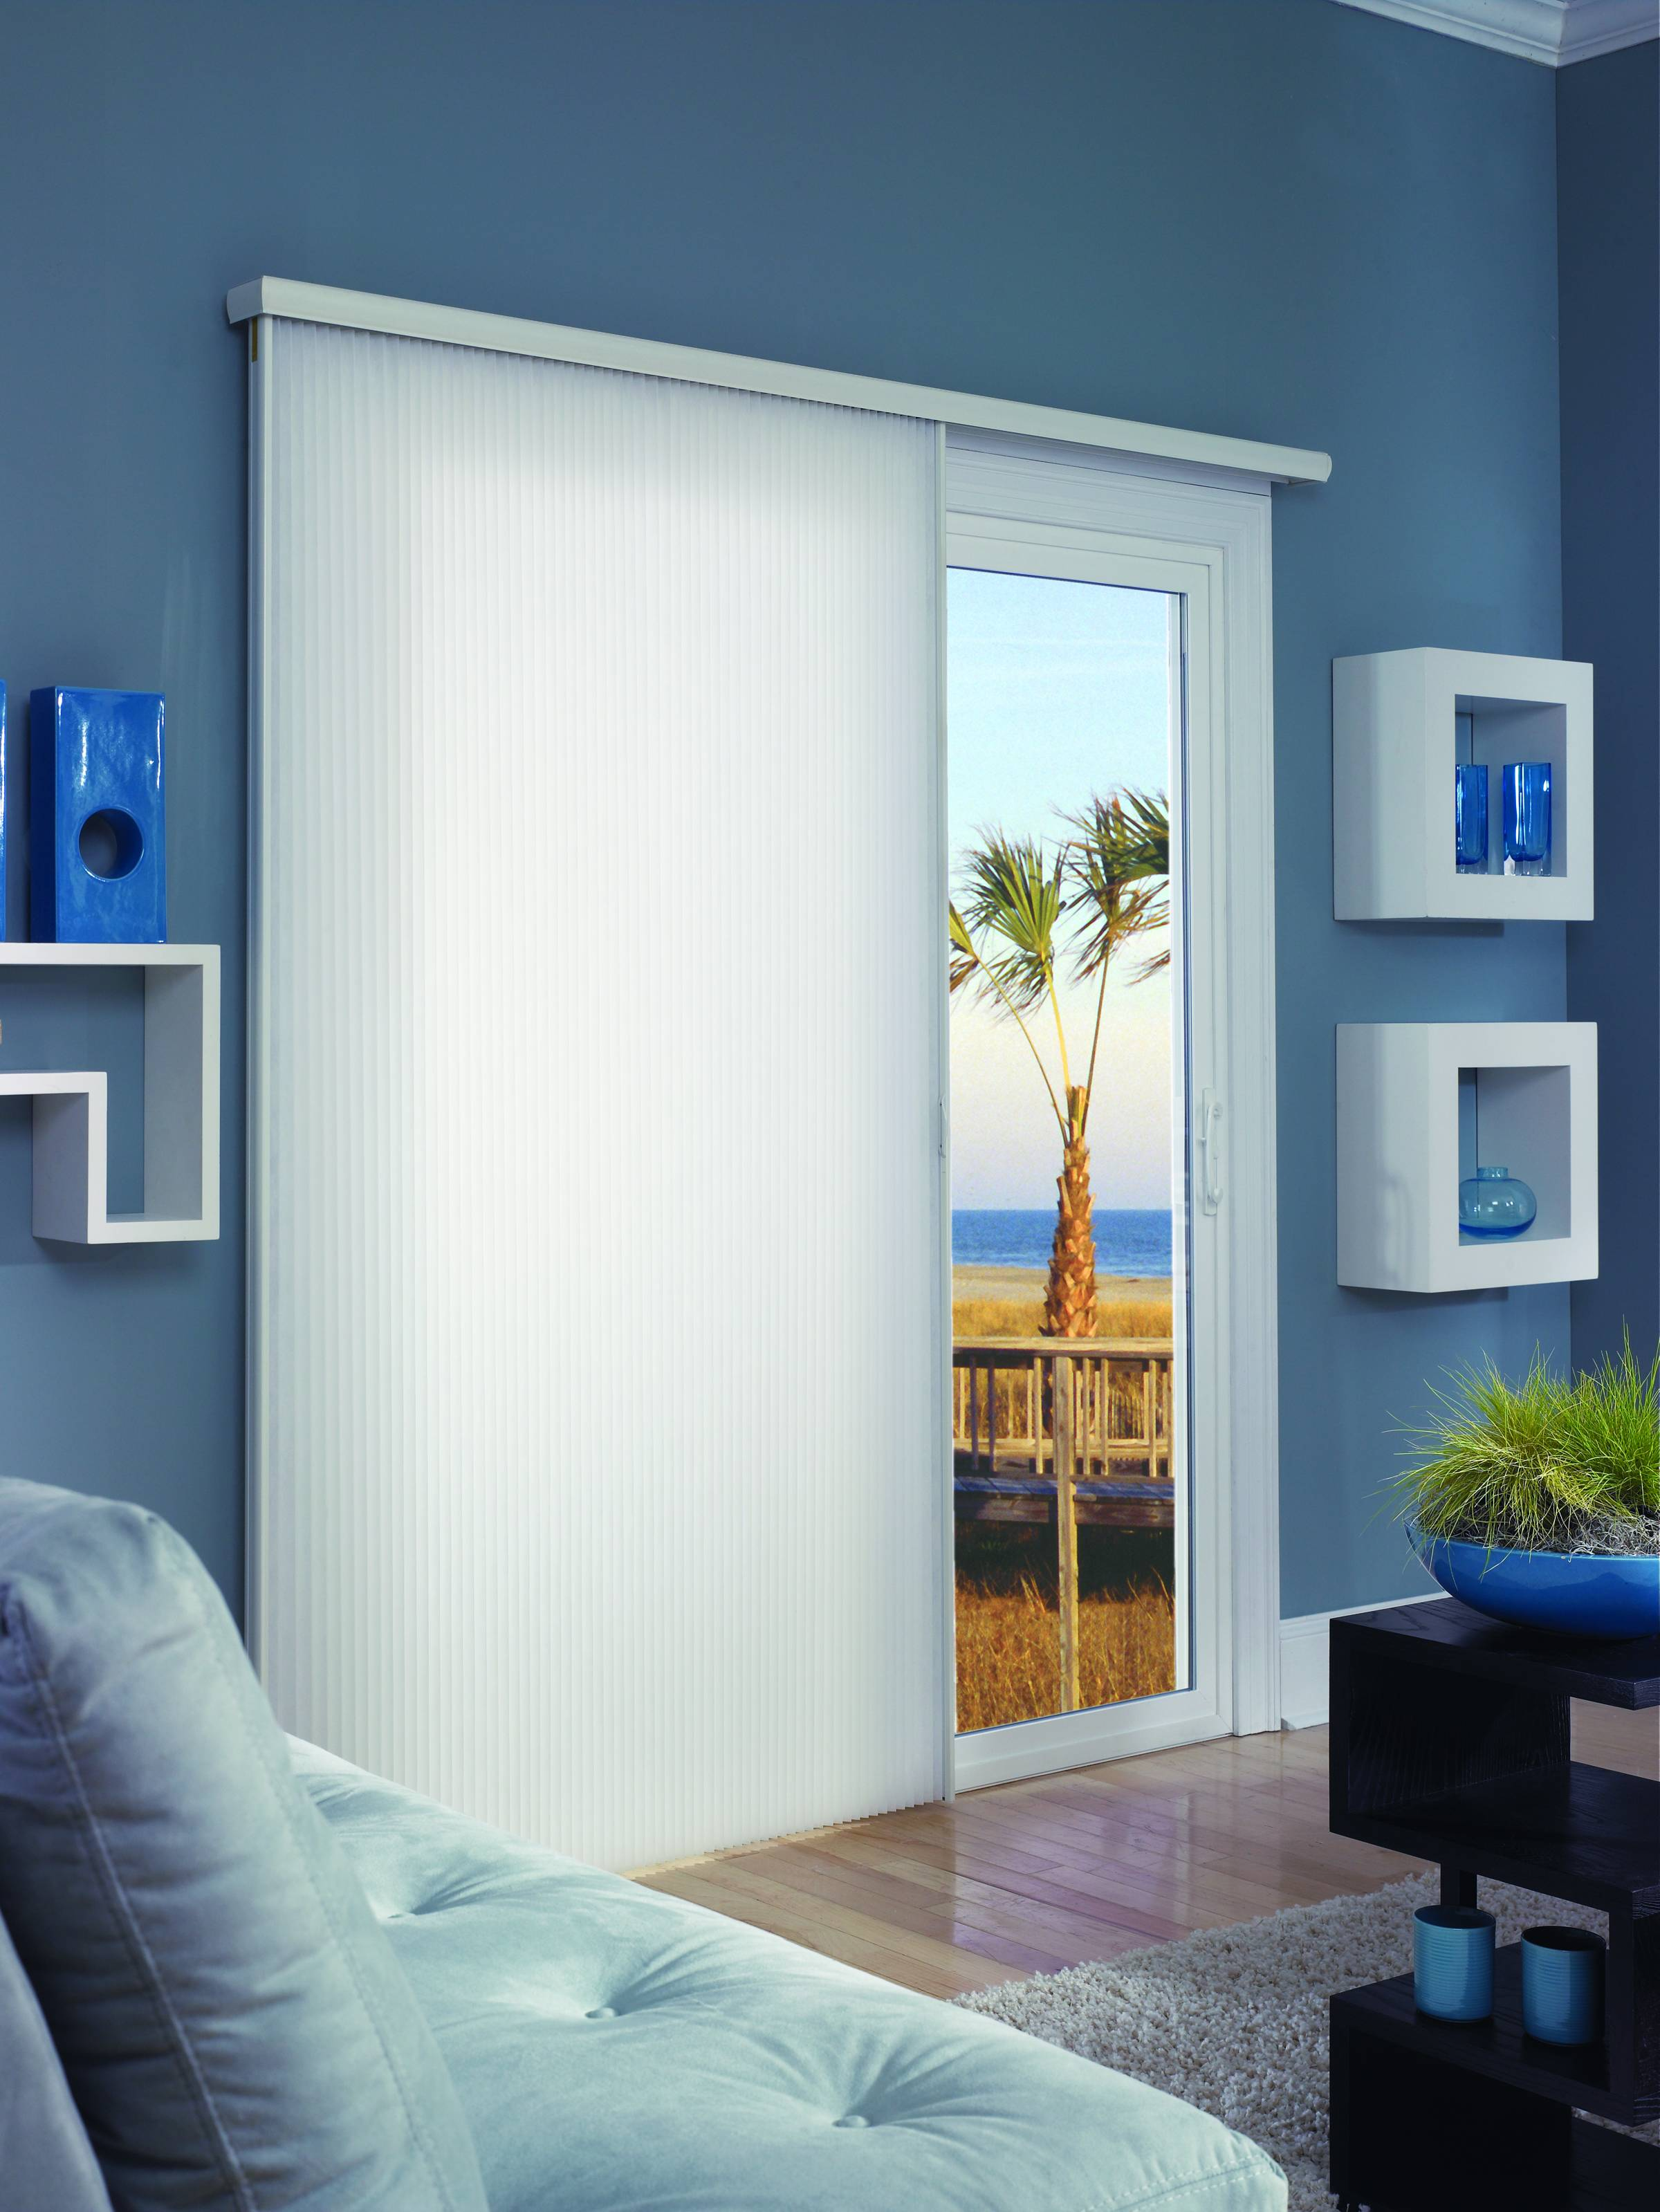 Comfortex Cellular Slider   Patio Door · 299781_448421001898180_187995656_n  · F441ccb66c64d43c69249b5a7df59eaa